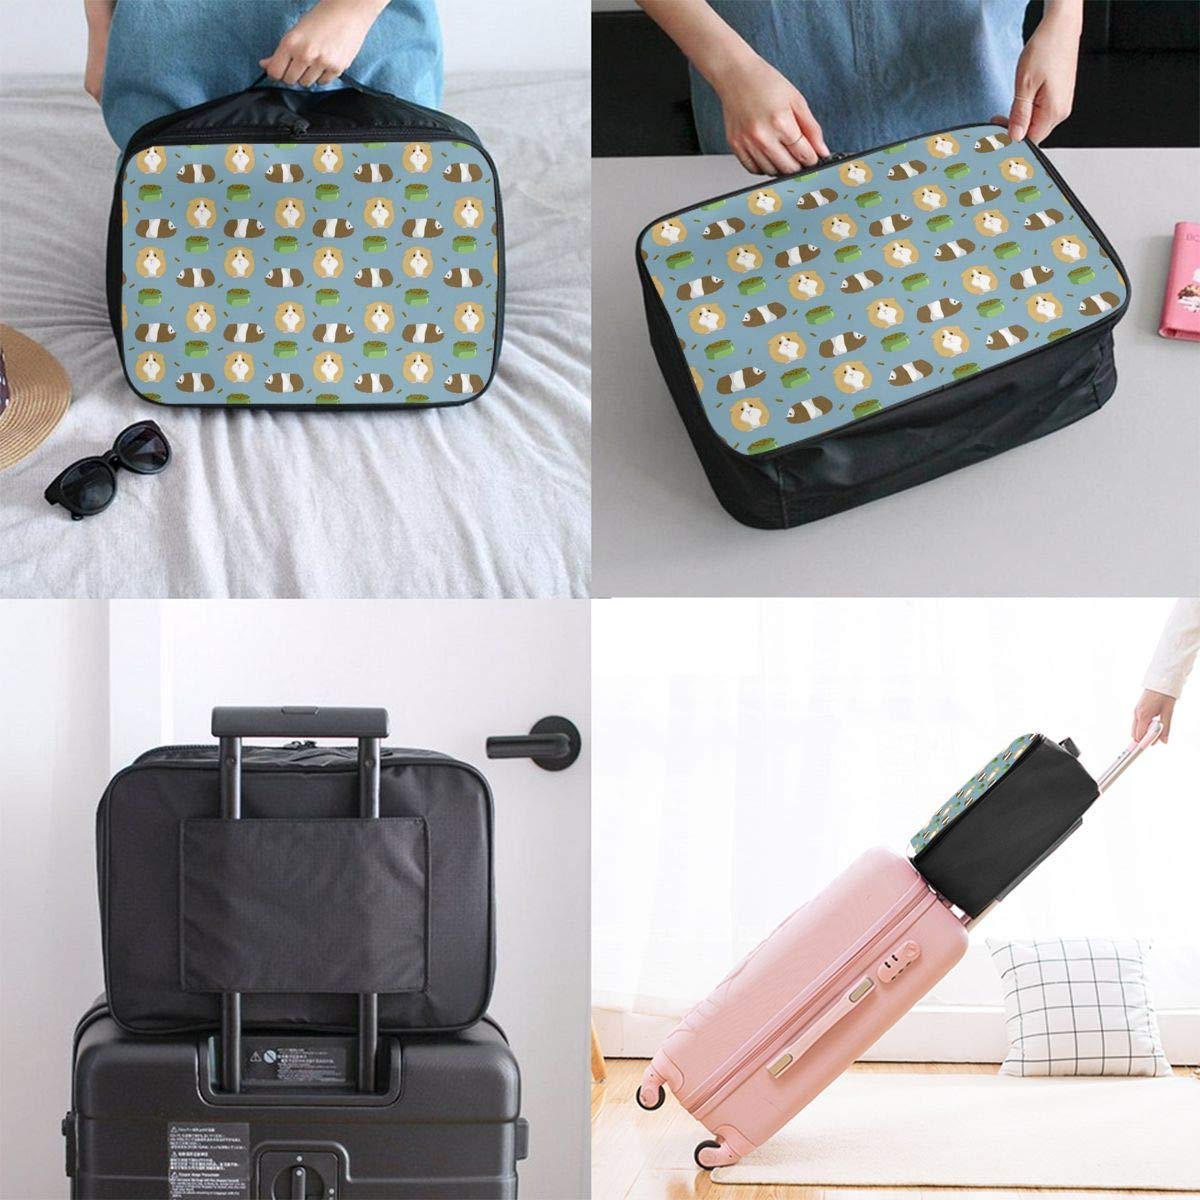 Lightweight Large Capacity Portable Luggage Bag Guinea Pig Print Travel Duffel Bag Backpack